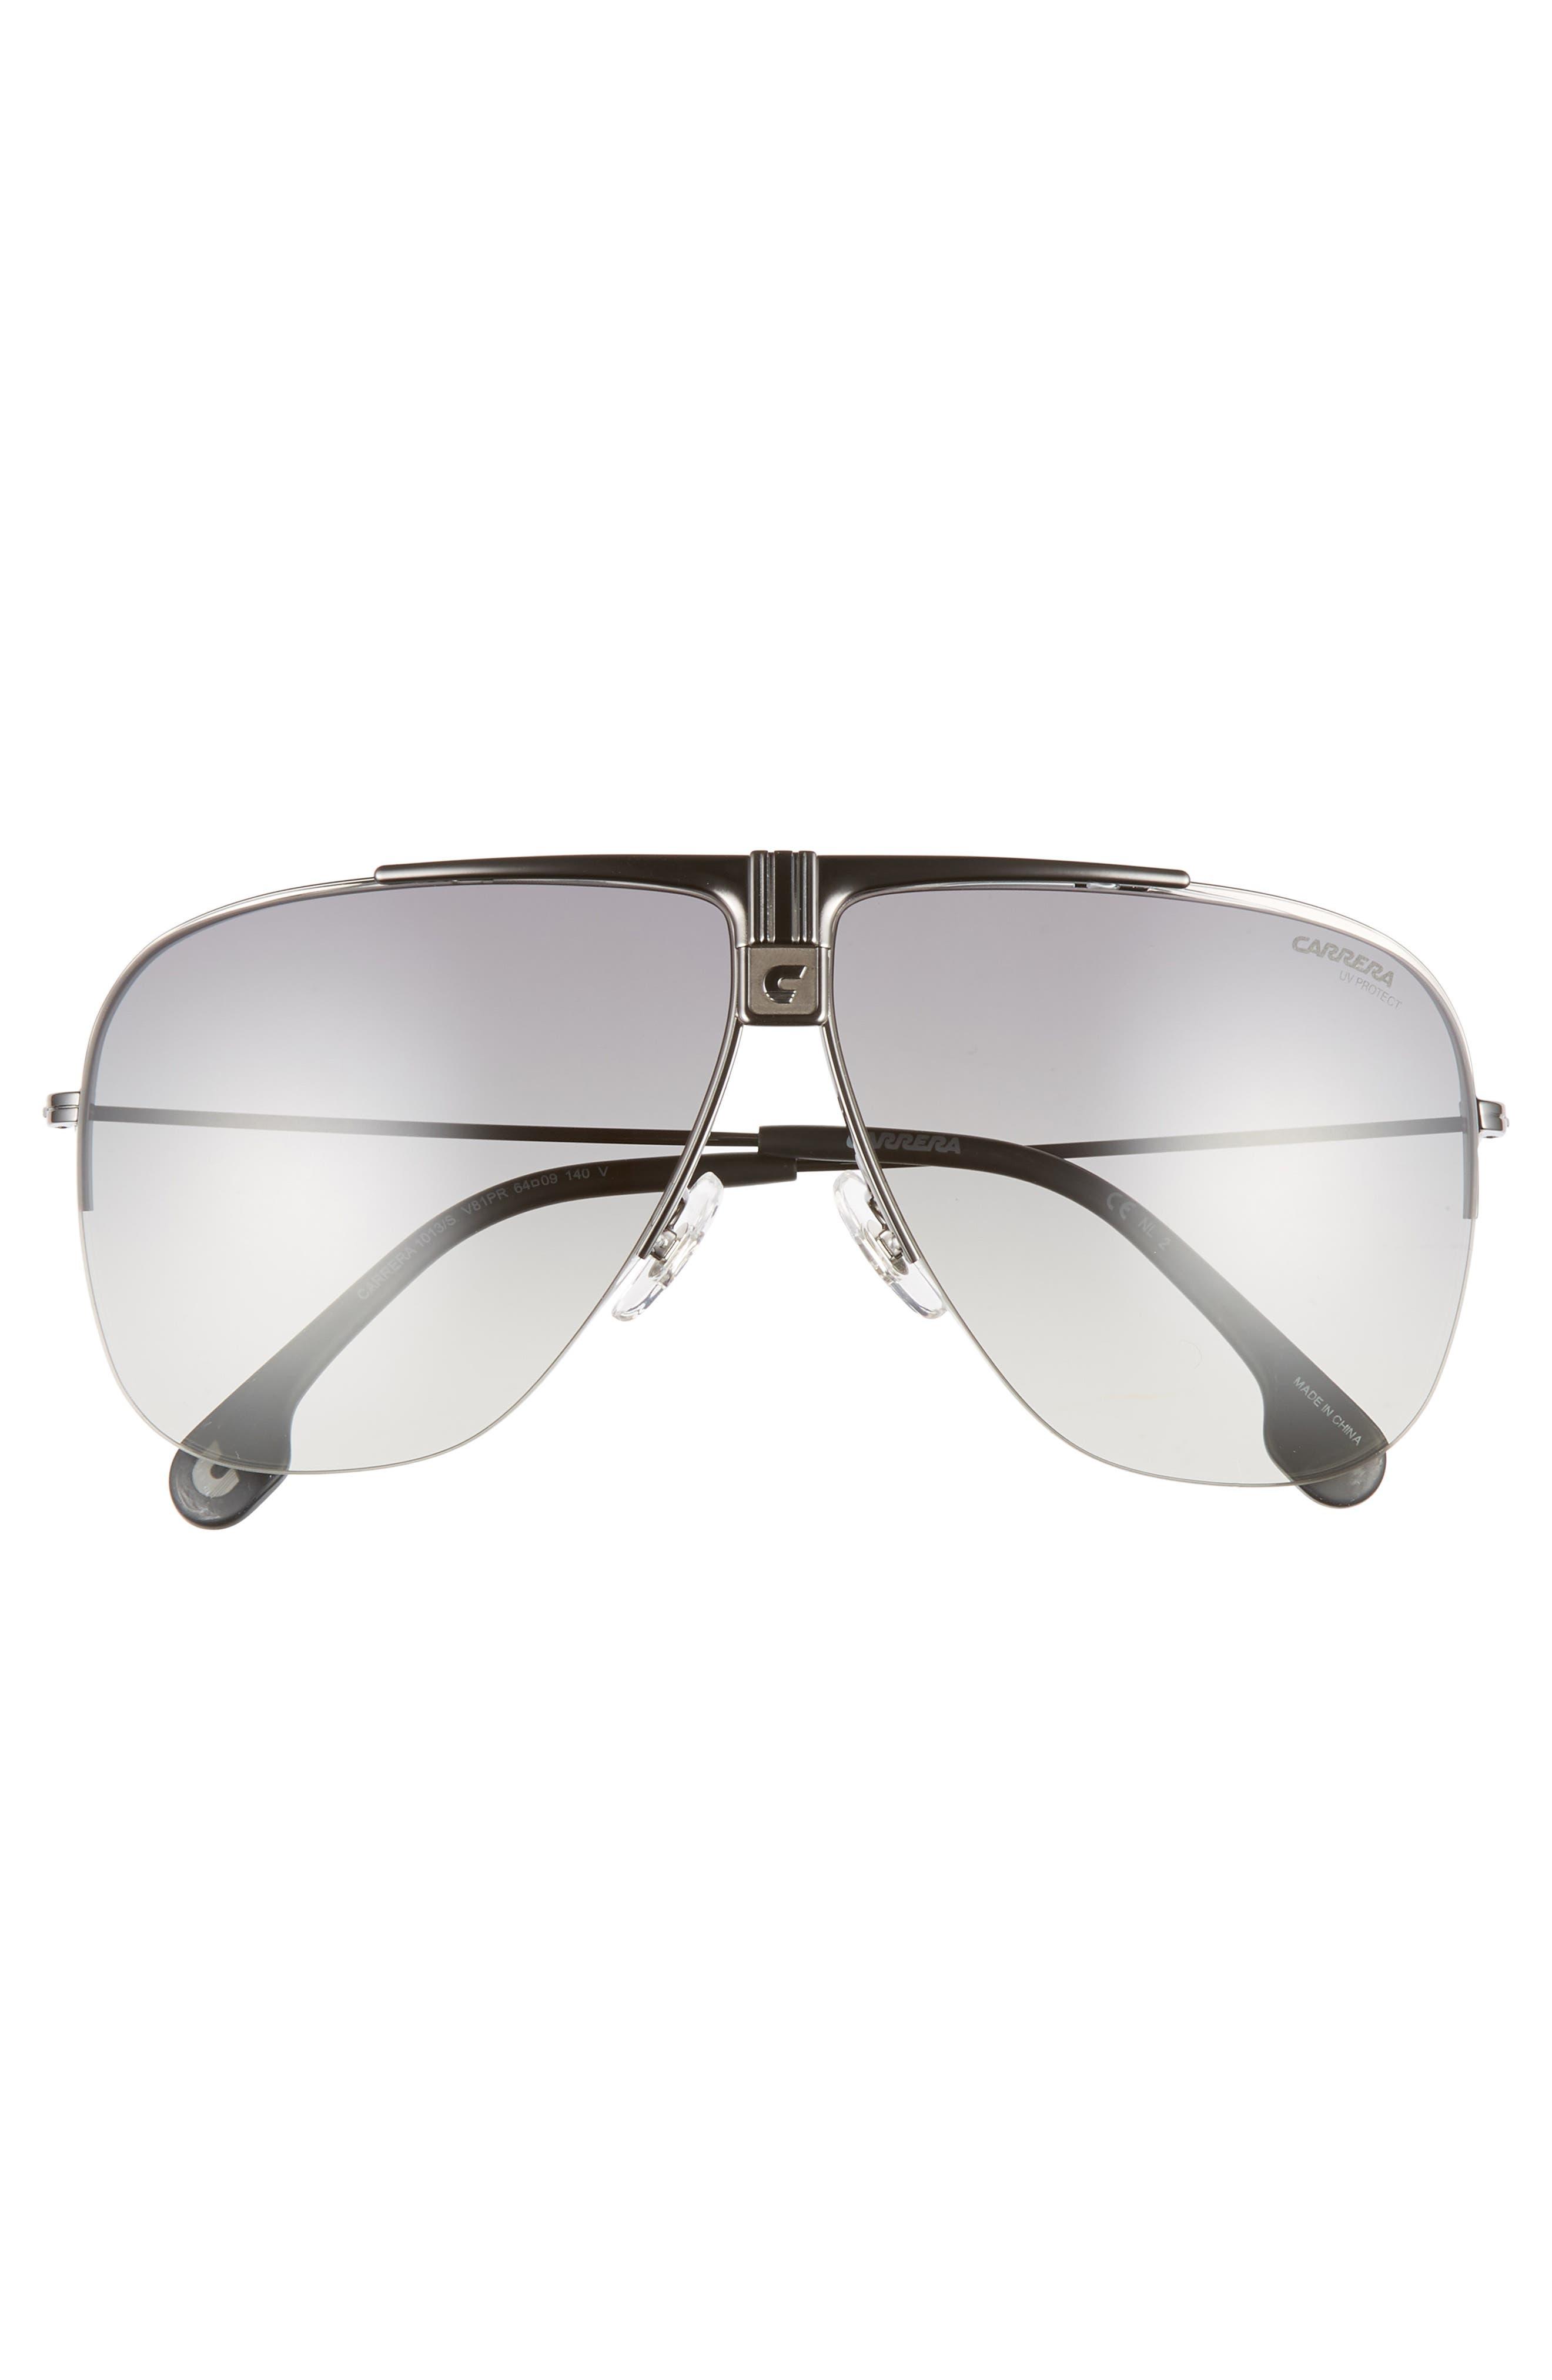 64mm Metal Aviator Sunglasses,                             Alternate thumbnail 2, color,                             DARK RUTHENIUM/ BLACK